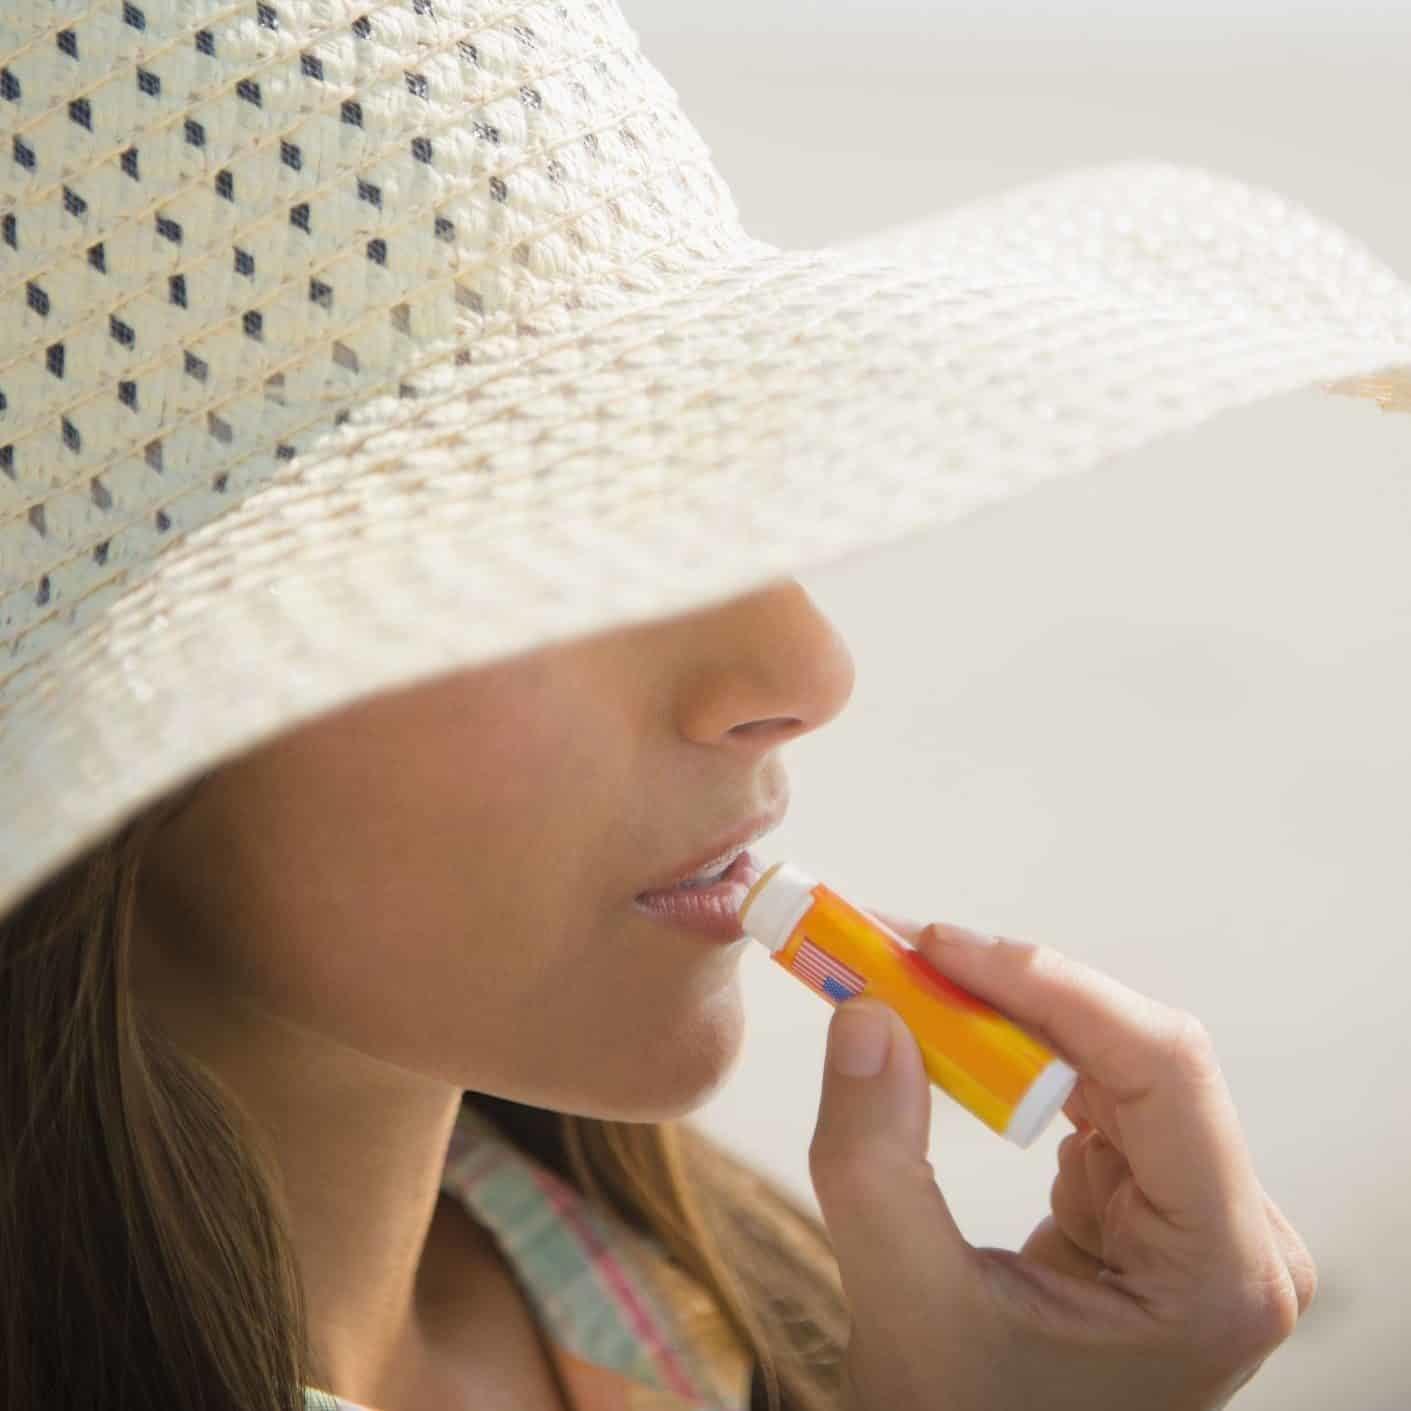 caucasian-woman-applying-sunscreen-lip-balm-at-royalty-free-image-526295481-1557352171-e1592832970743-1049607